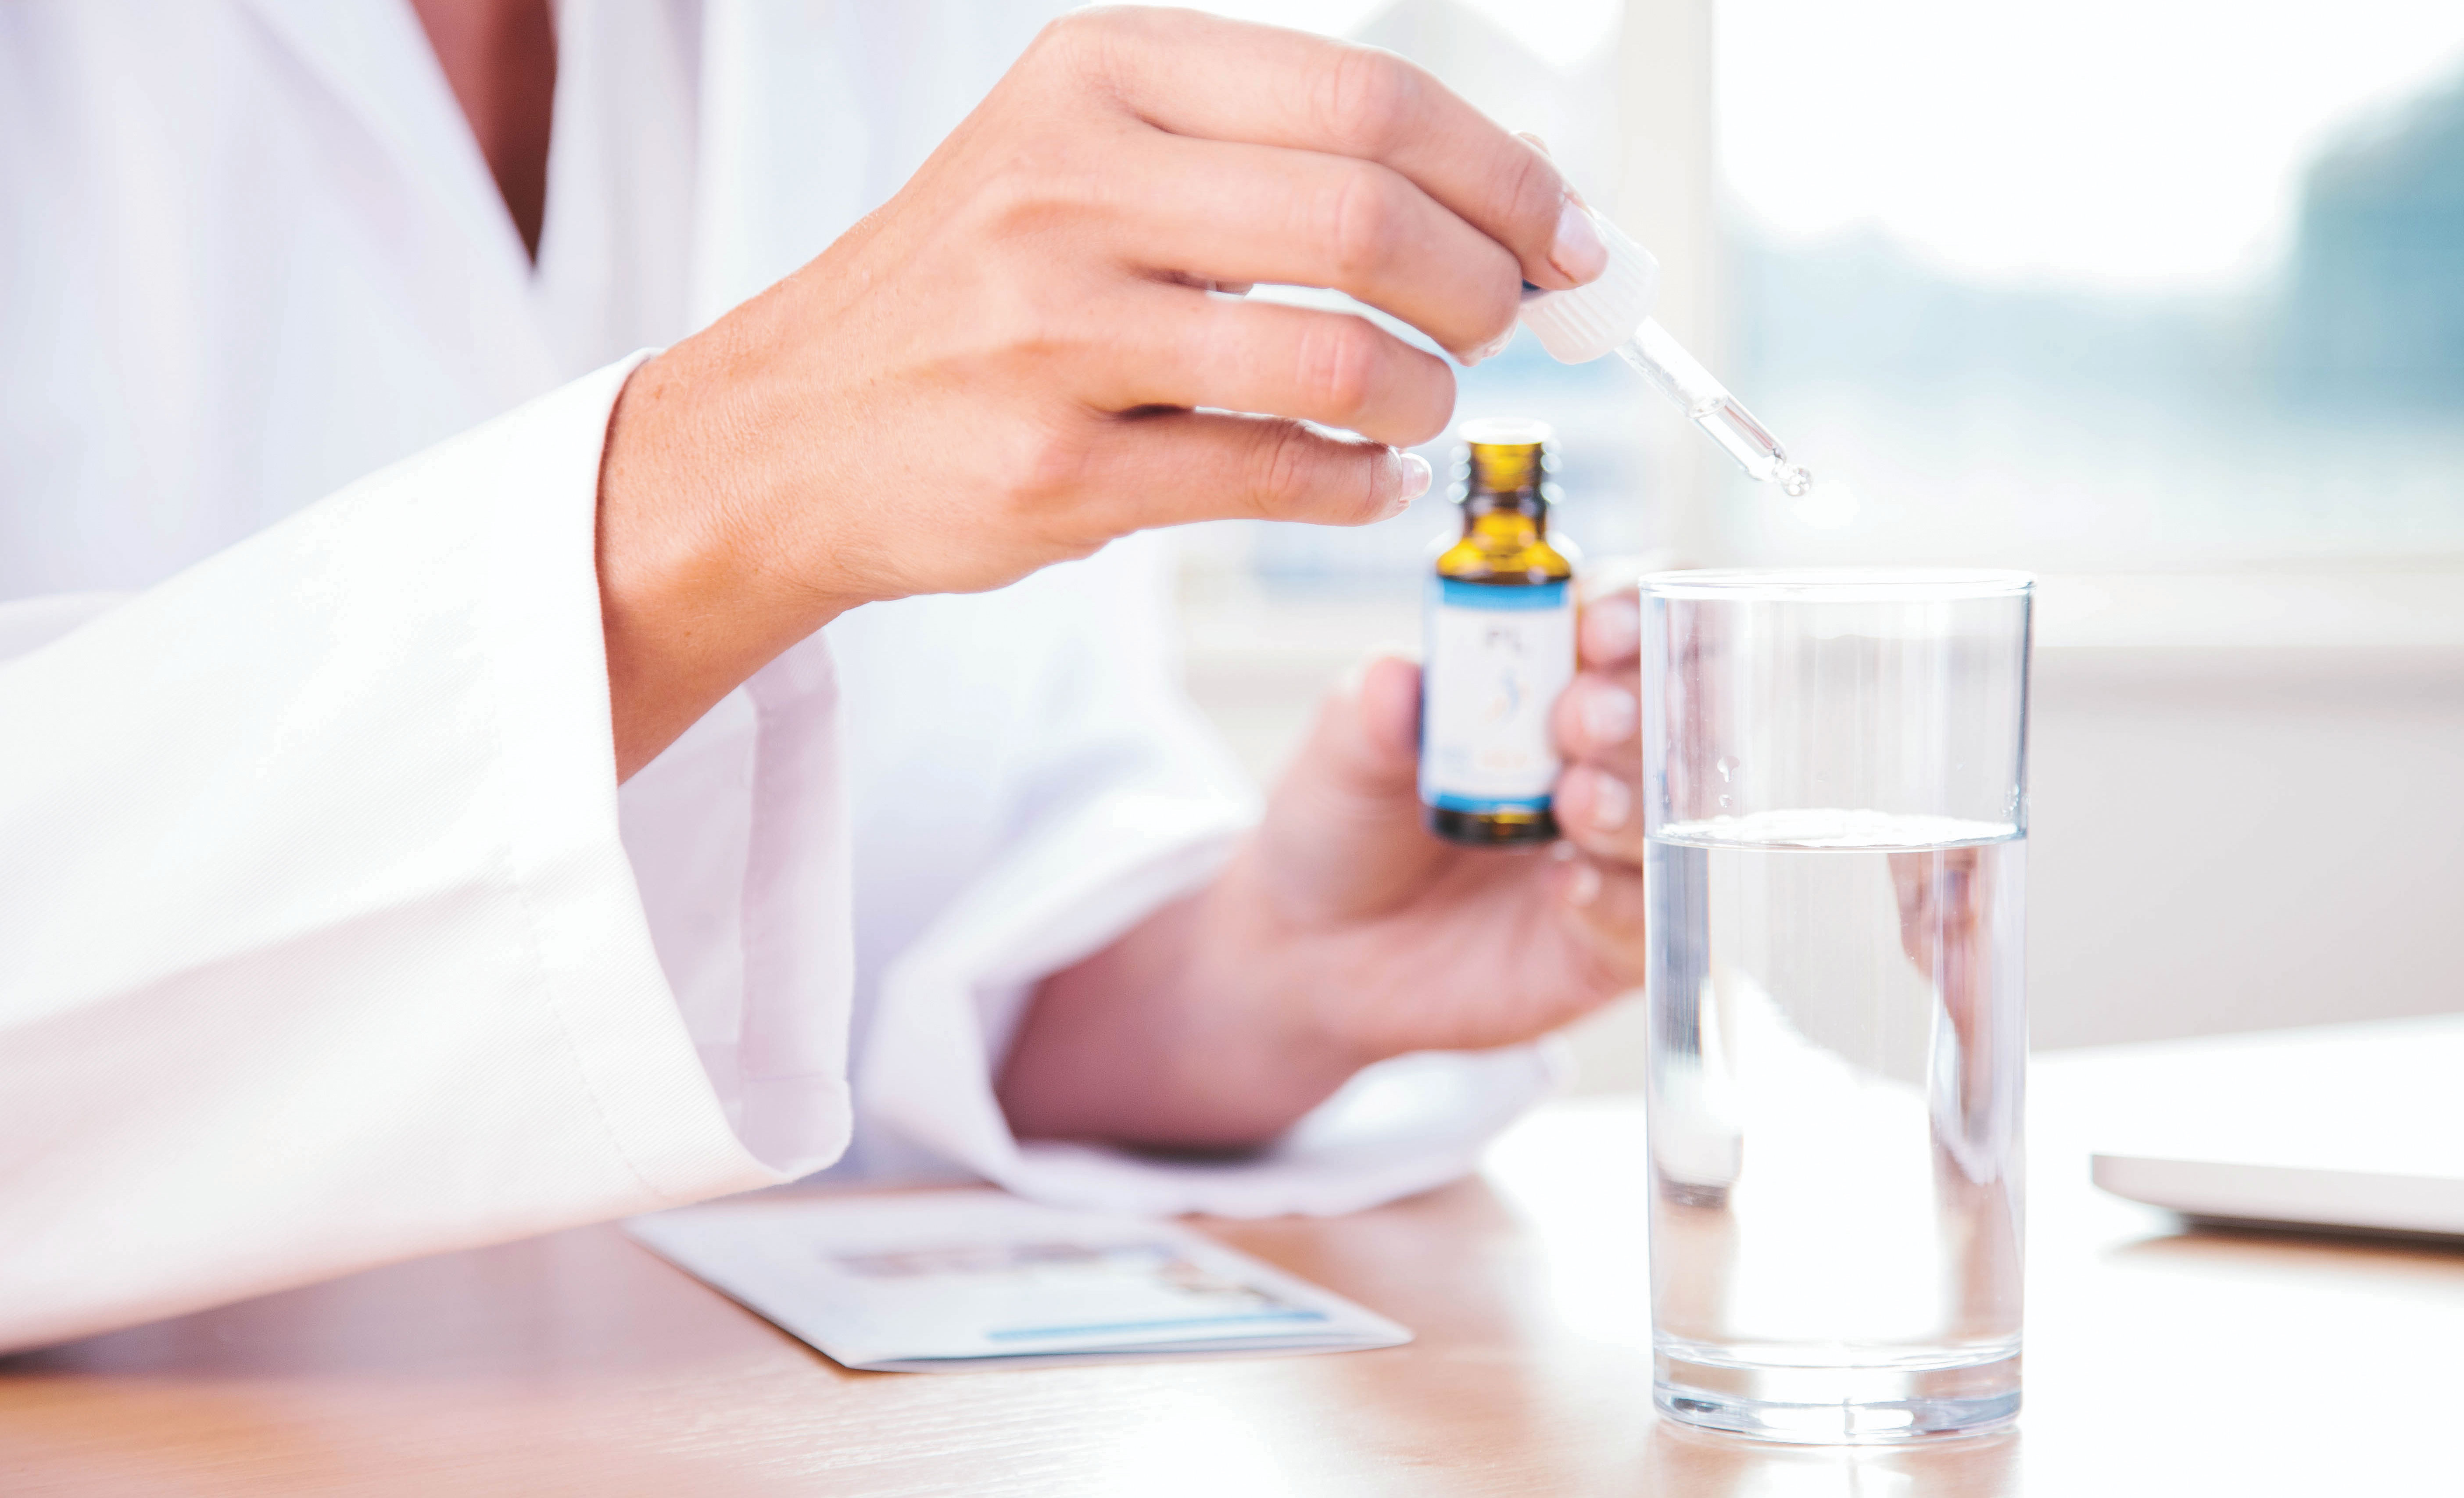 Adding-infoceuticals-to-water